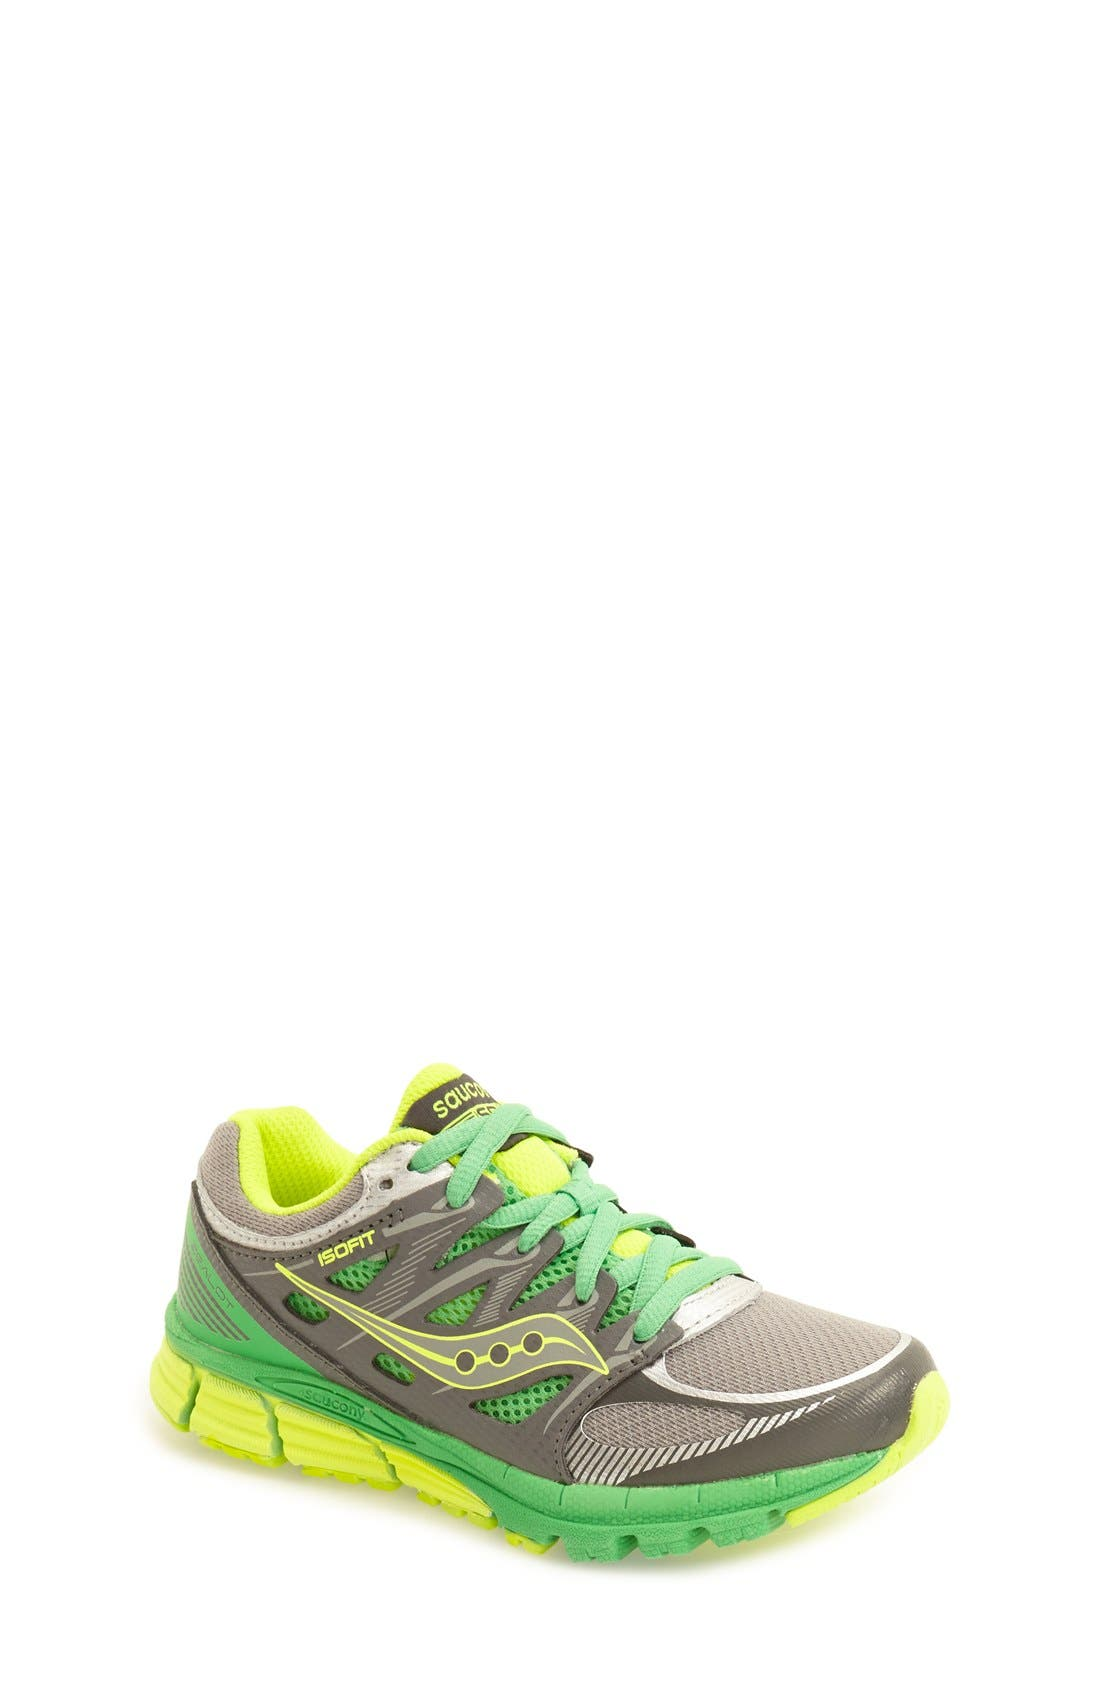 Main Image - Saucony 'Zealot' Athletic Shoe (Toddler, Little Kid & Big Kid)